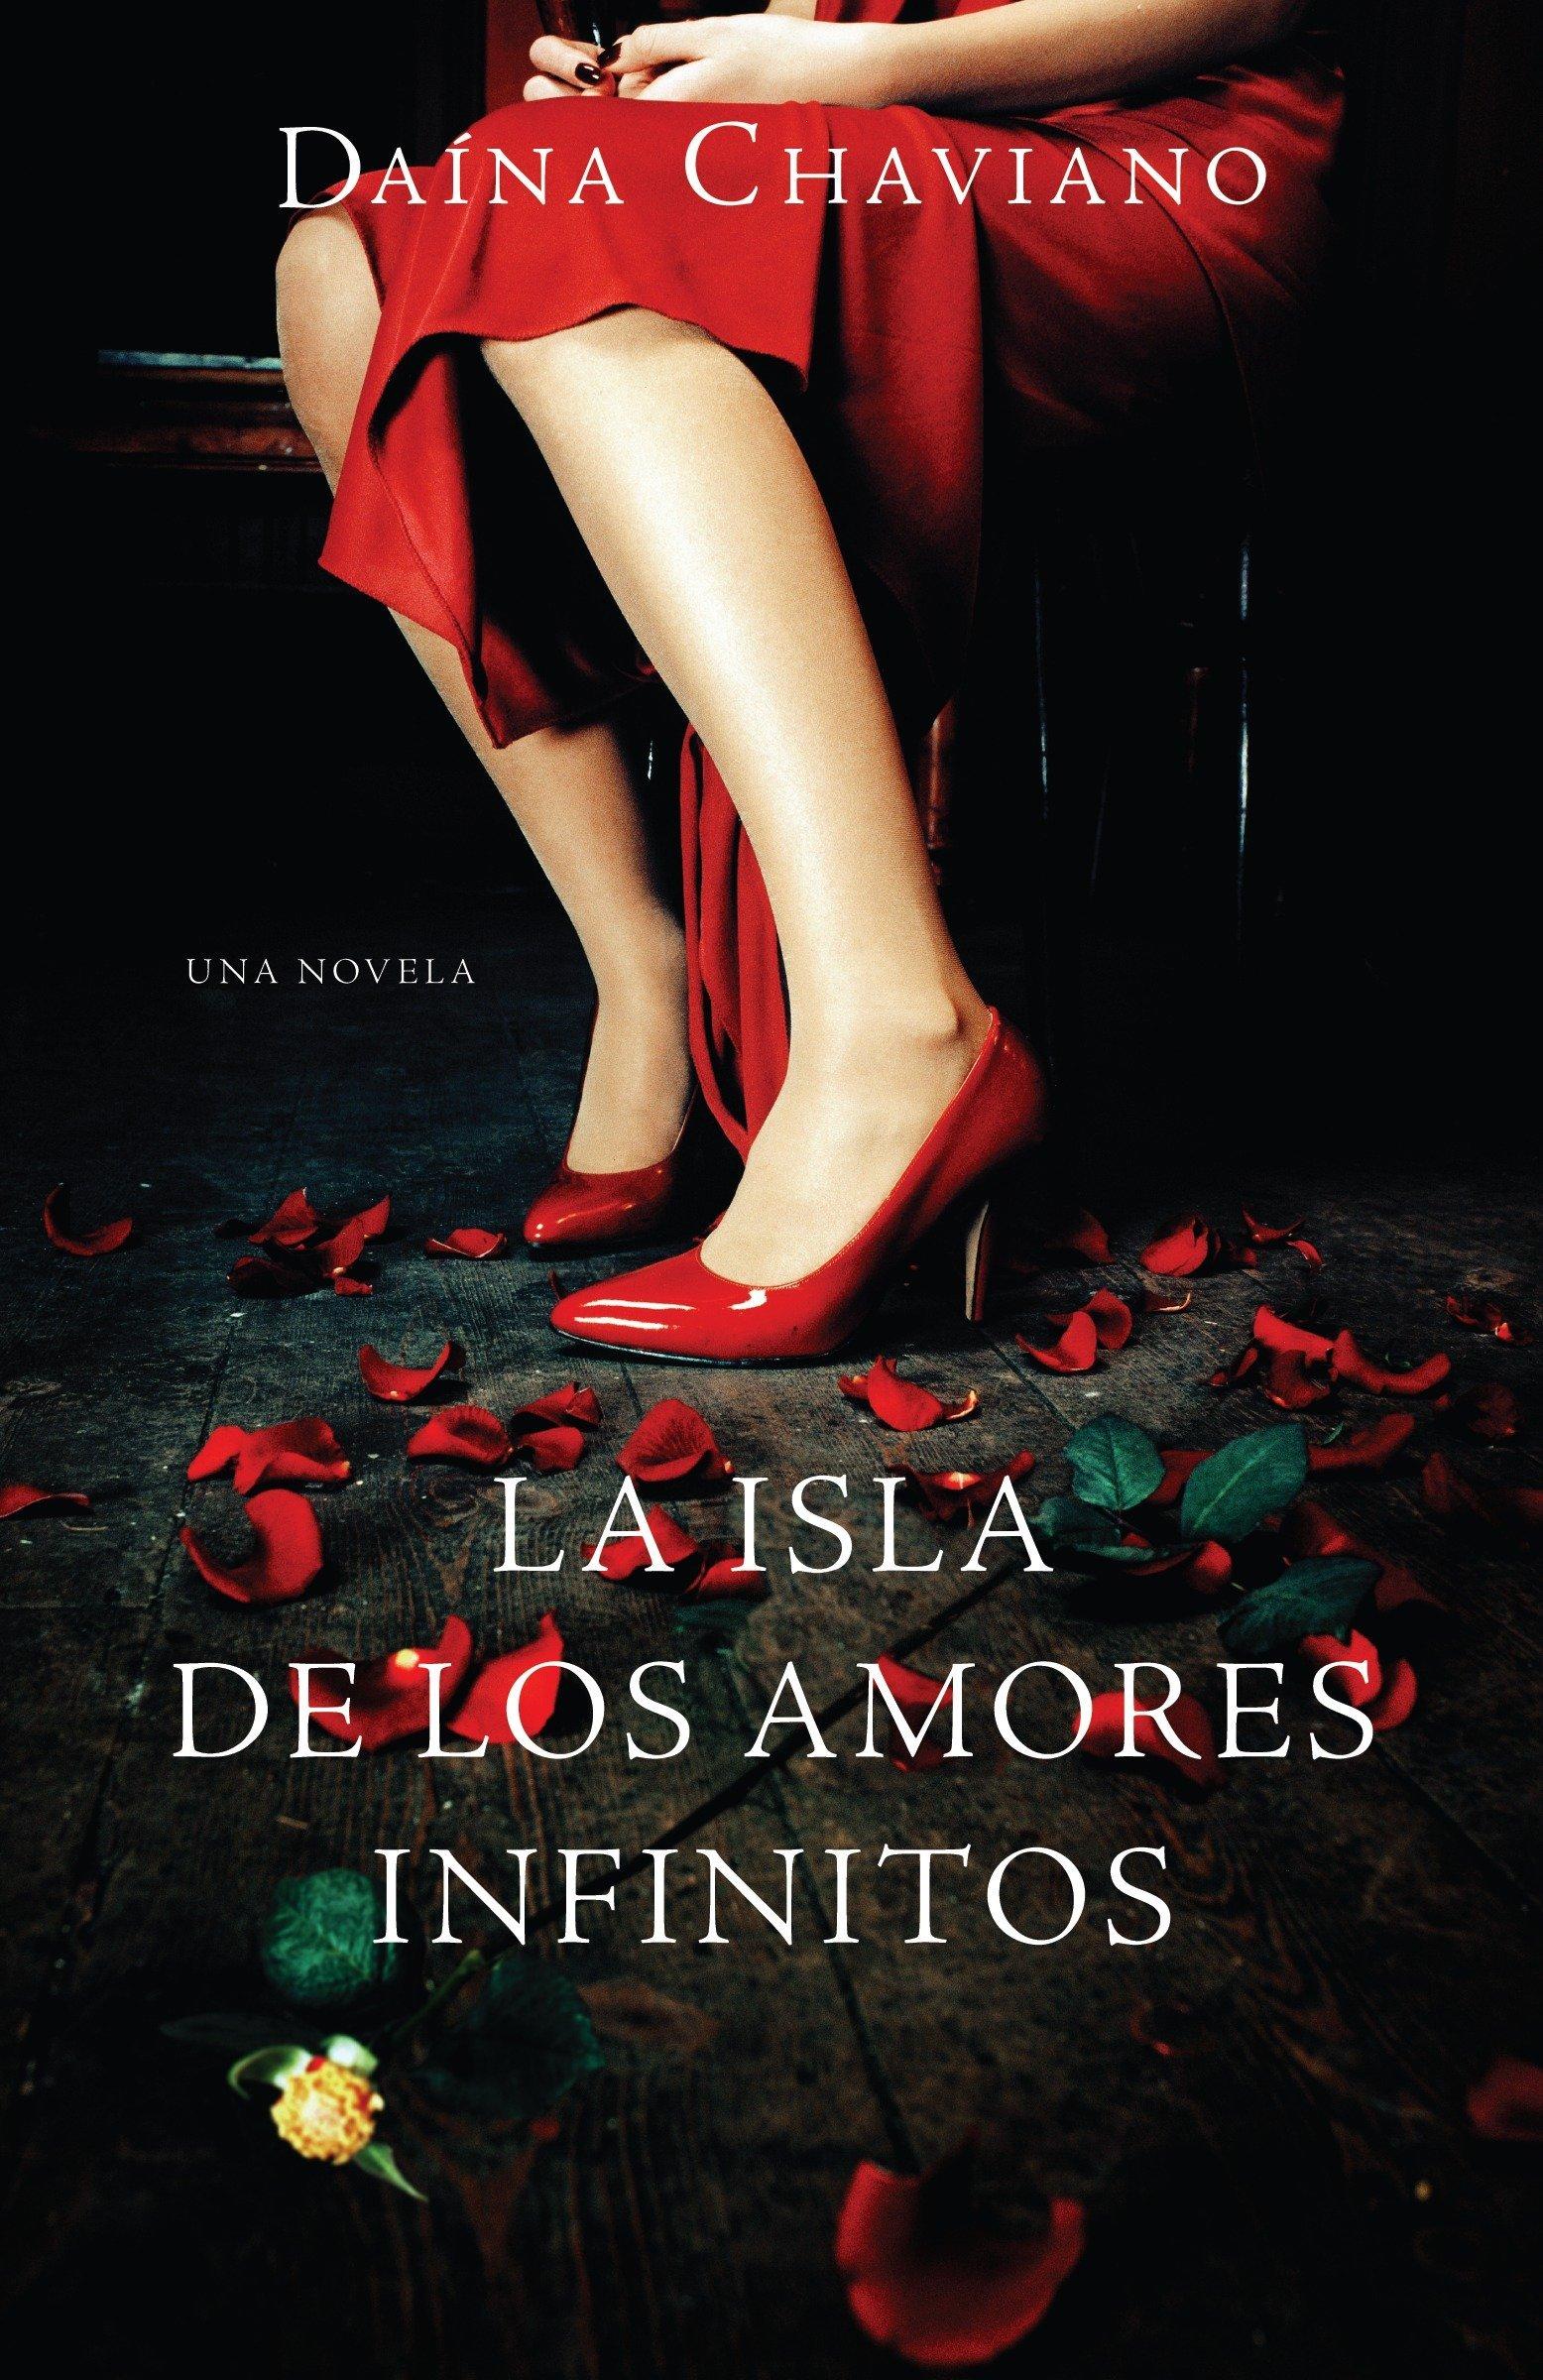 La isla de los amores infinitos (Vintage Espanol) (Spanish Edition) (Spanish) Paperback – March 1, 2011 Daína Chaviano 0307475832 Family Life Historical - General